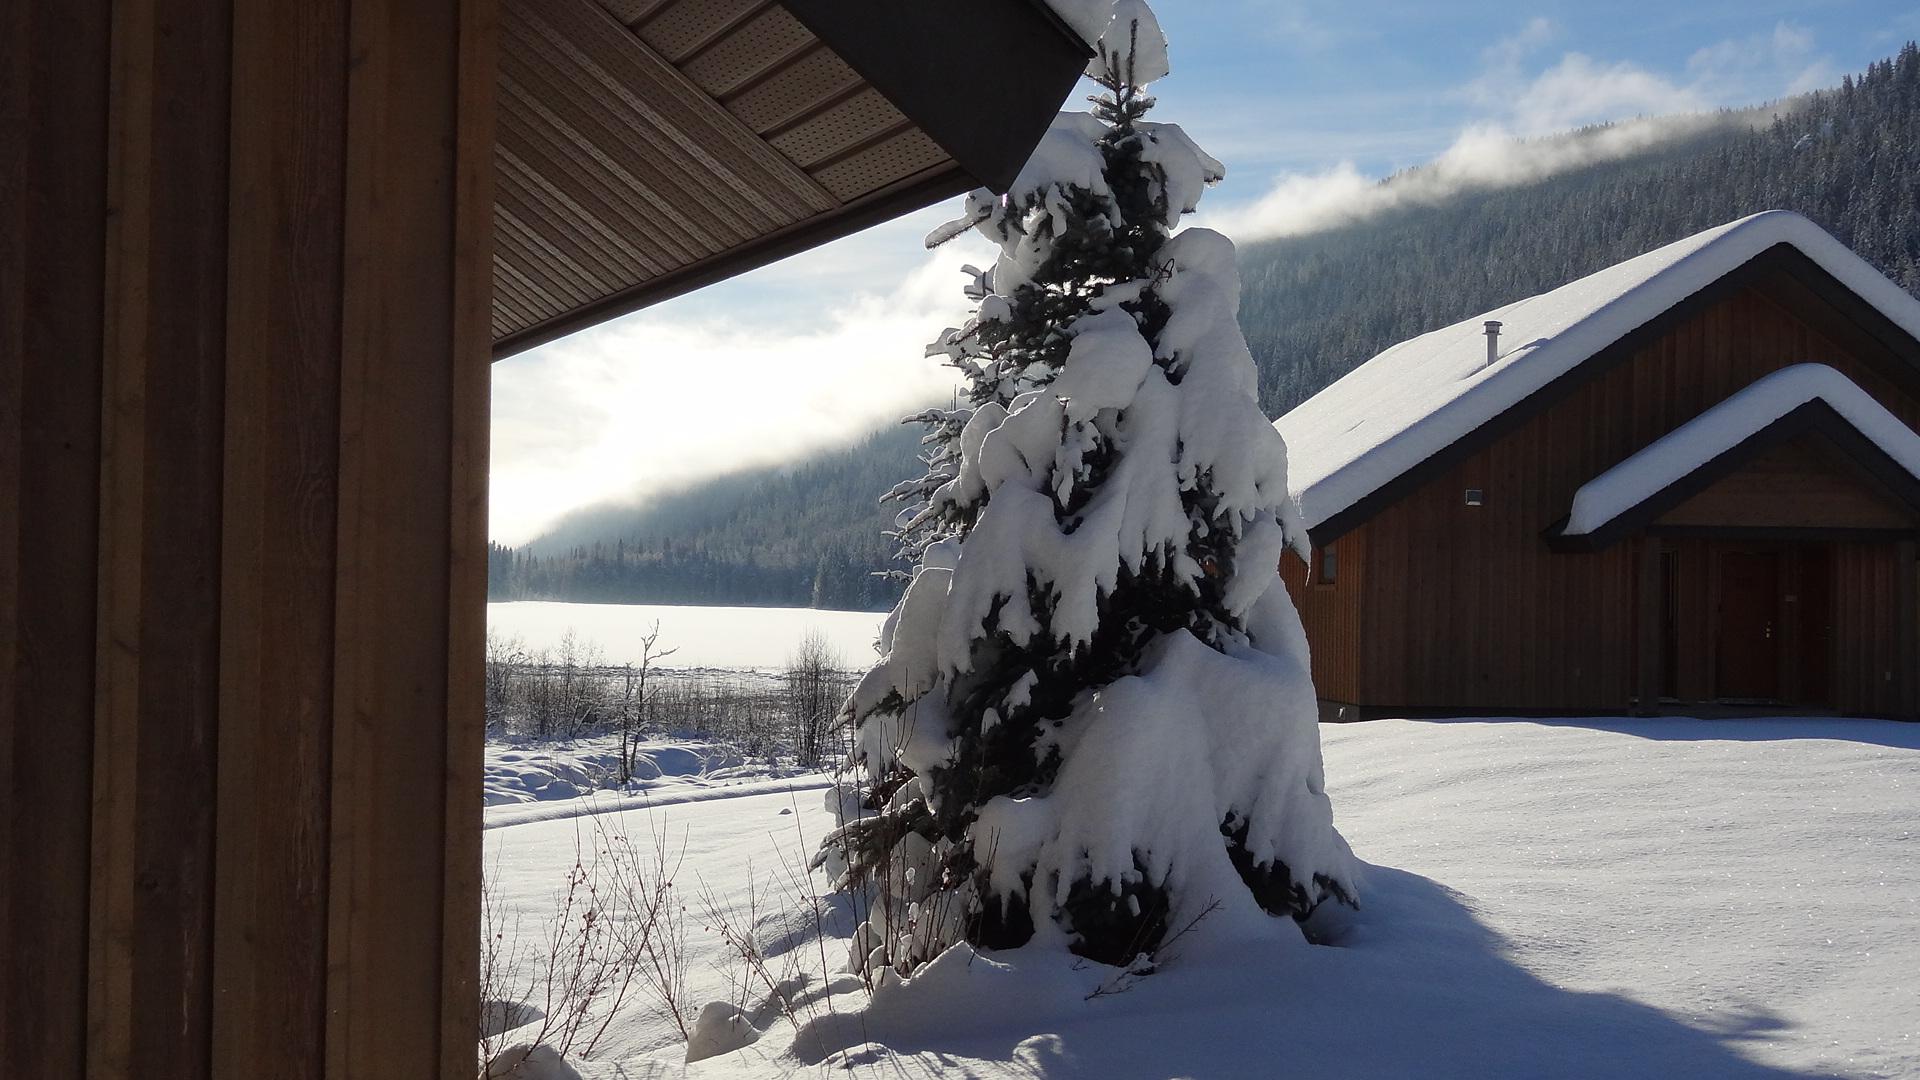 alpine meadows resort in snow